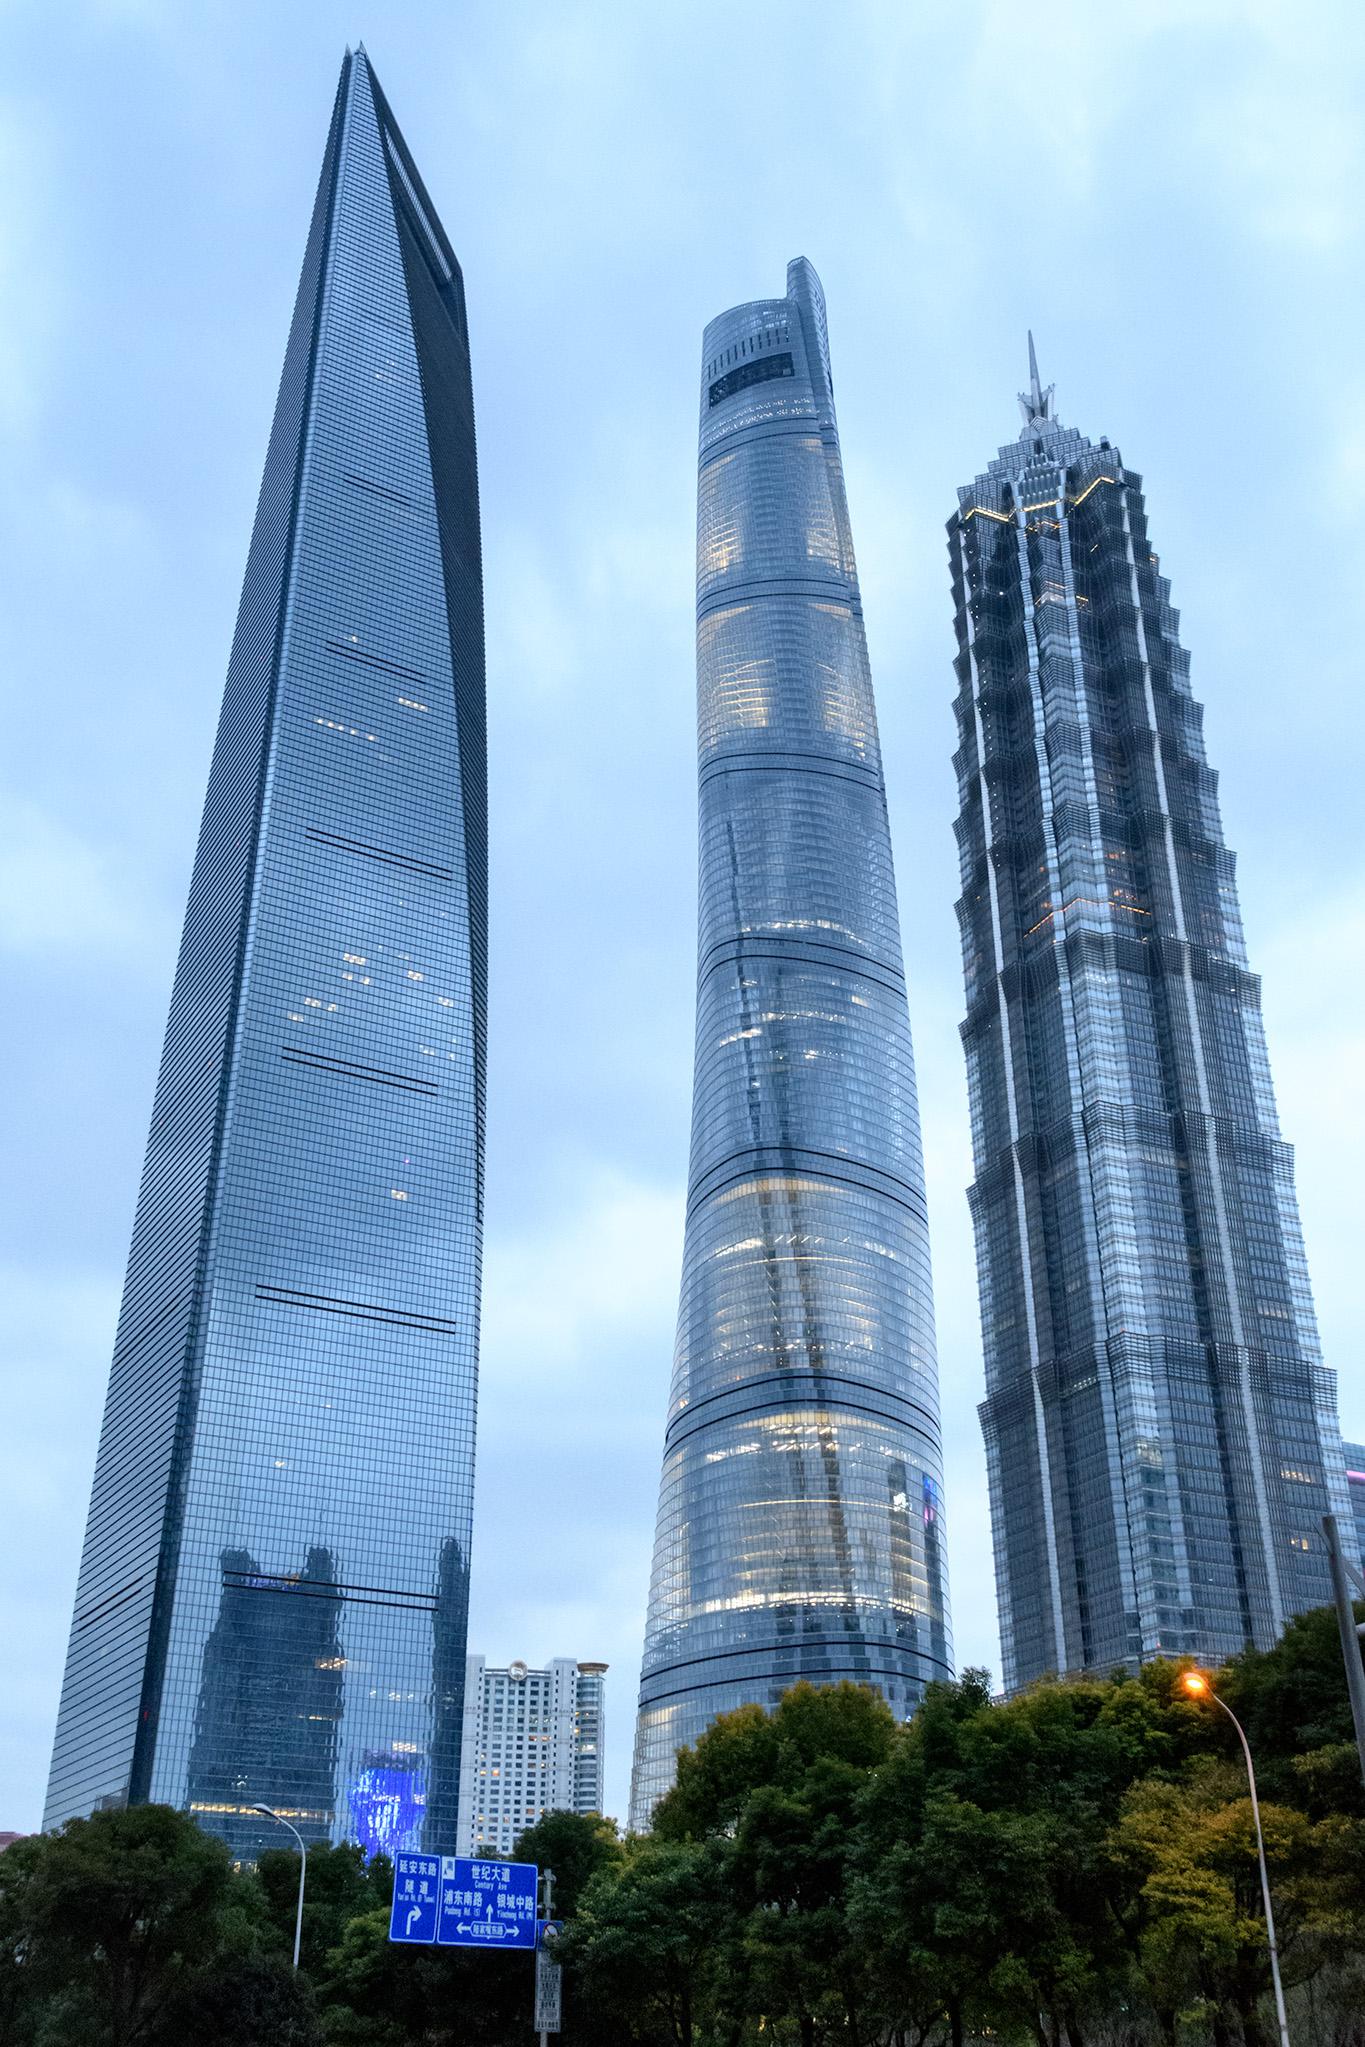 Shanghai World Financial Center, Shanghai Tower (the world's 2nd tallest building) & Jin Mao Tower